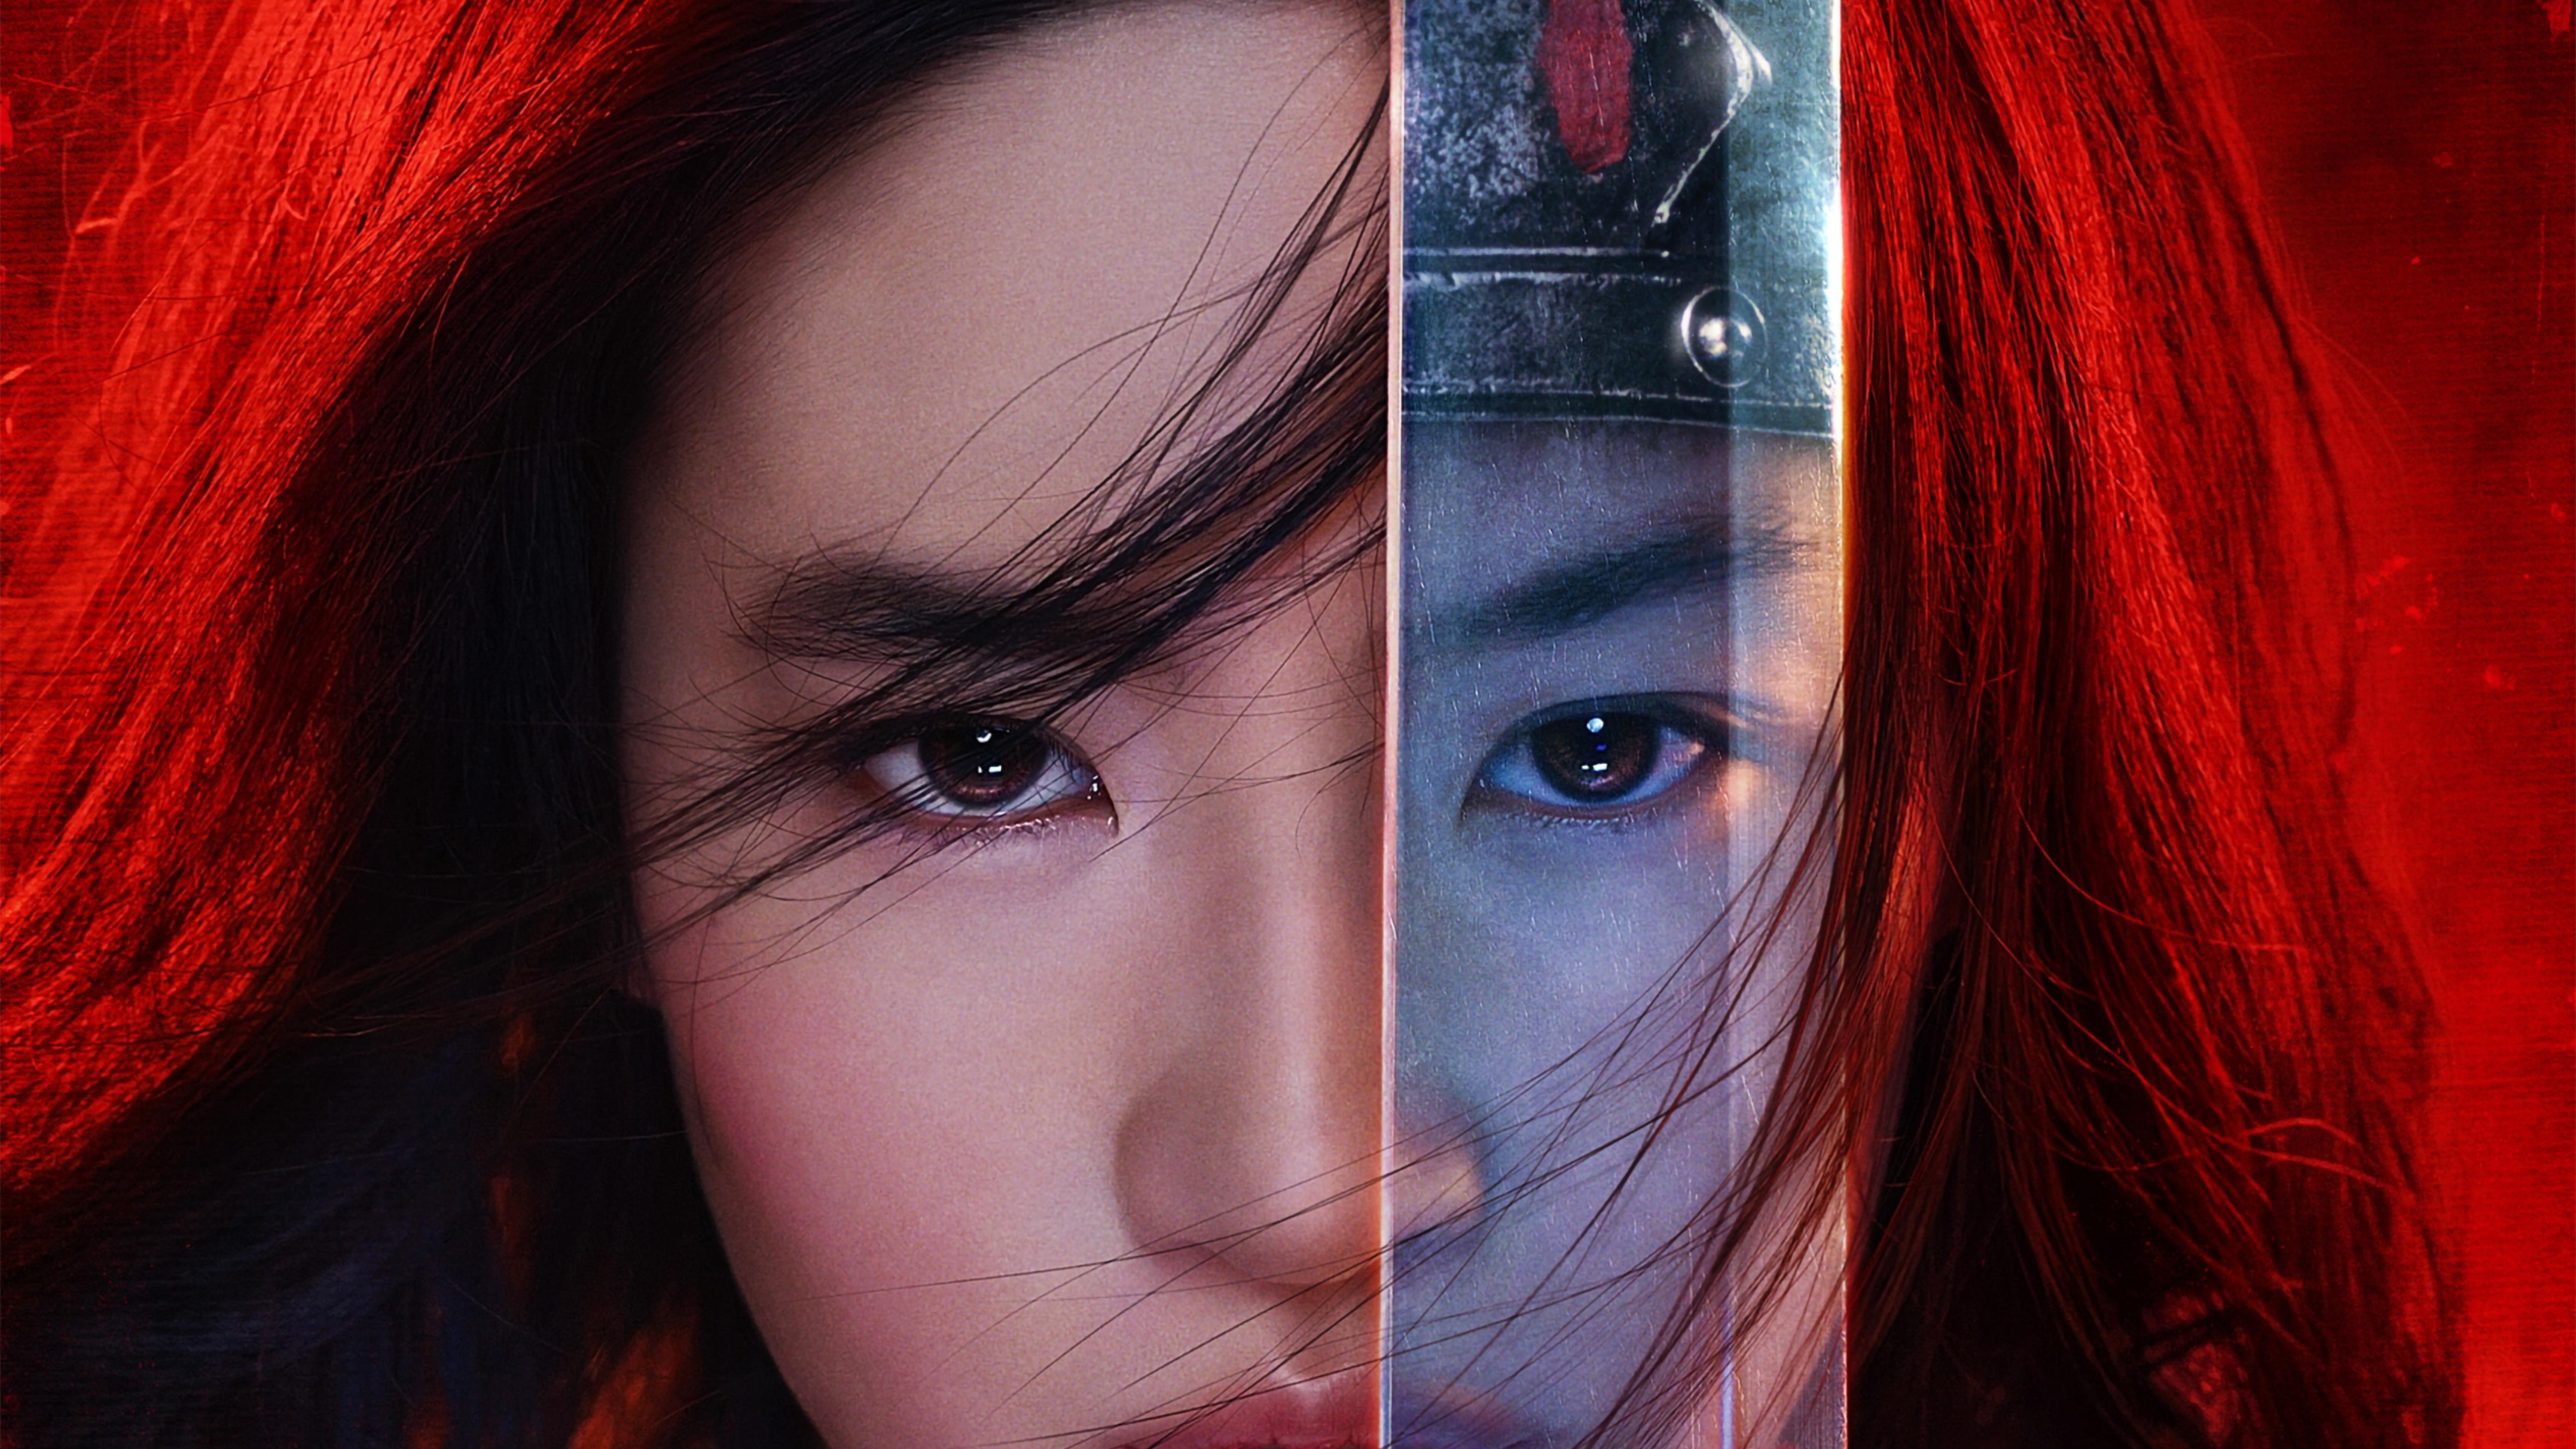 5120x2880 Mulan 2020 Movie Poster 5K Wallpaper HD Movies 4K 5120x2880